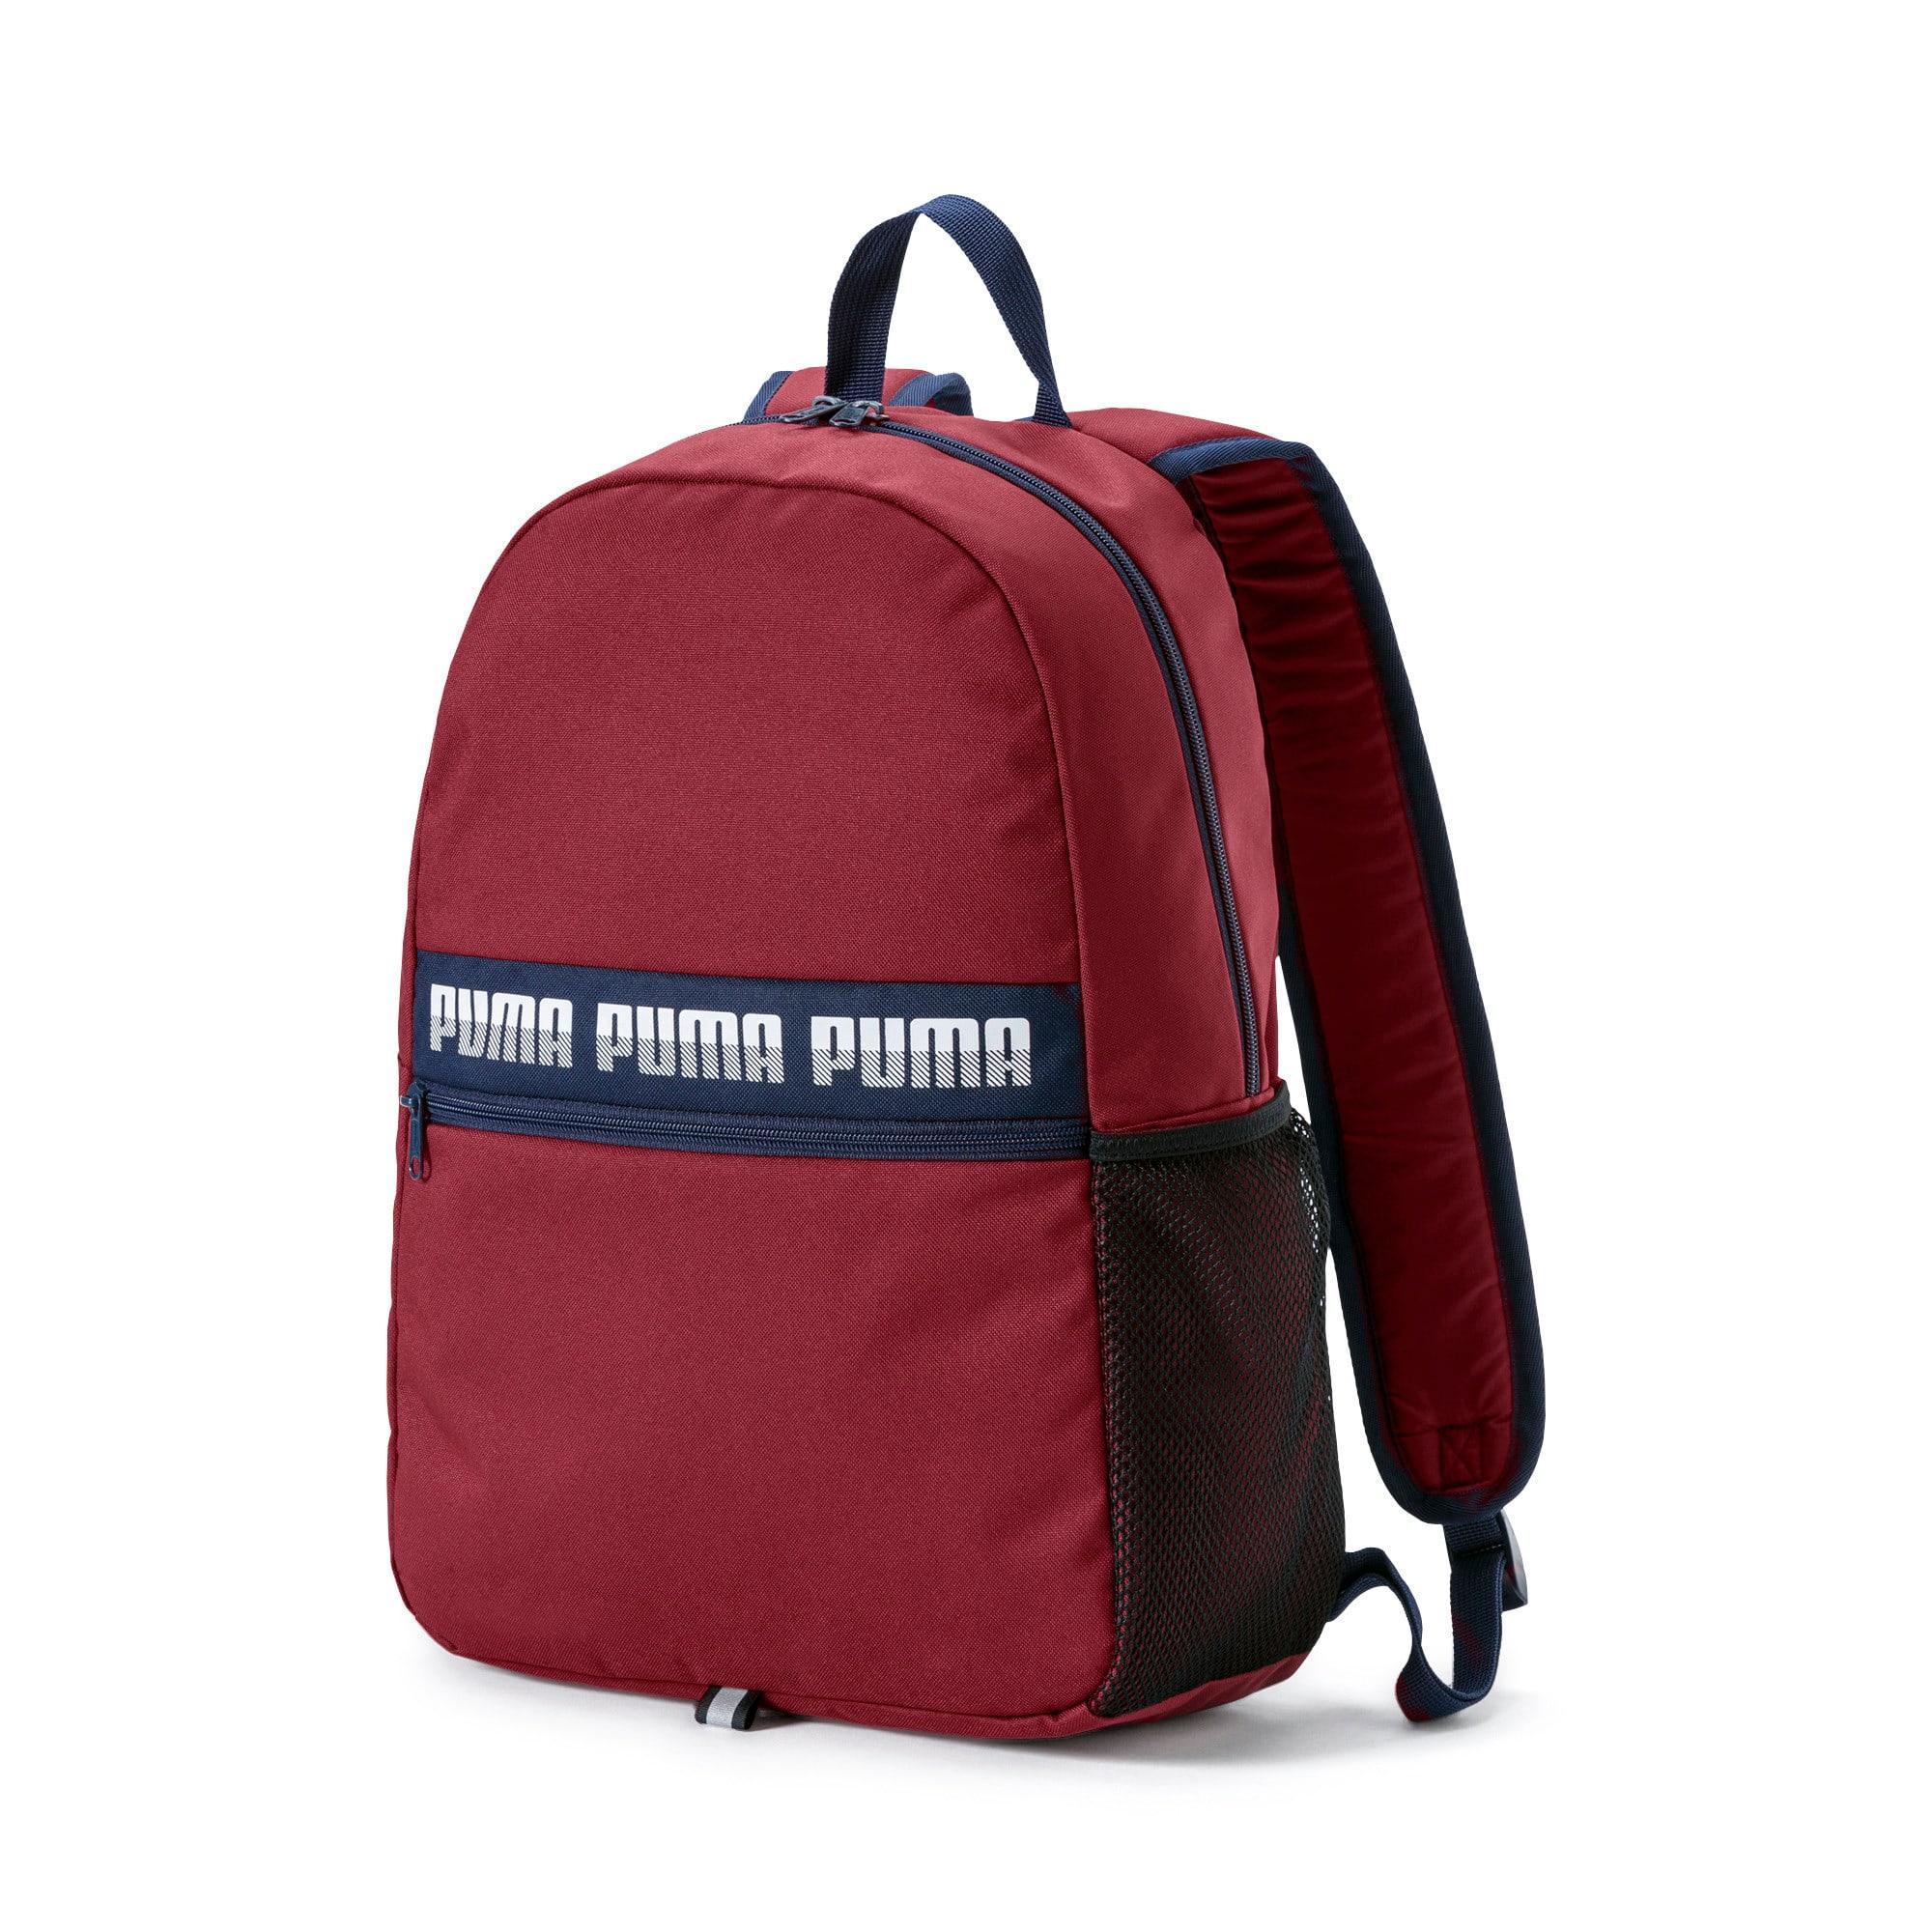 Thumbnail 1 of Phase Backpack II, Pomegranate, medium-IND